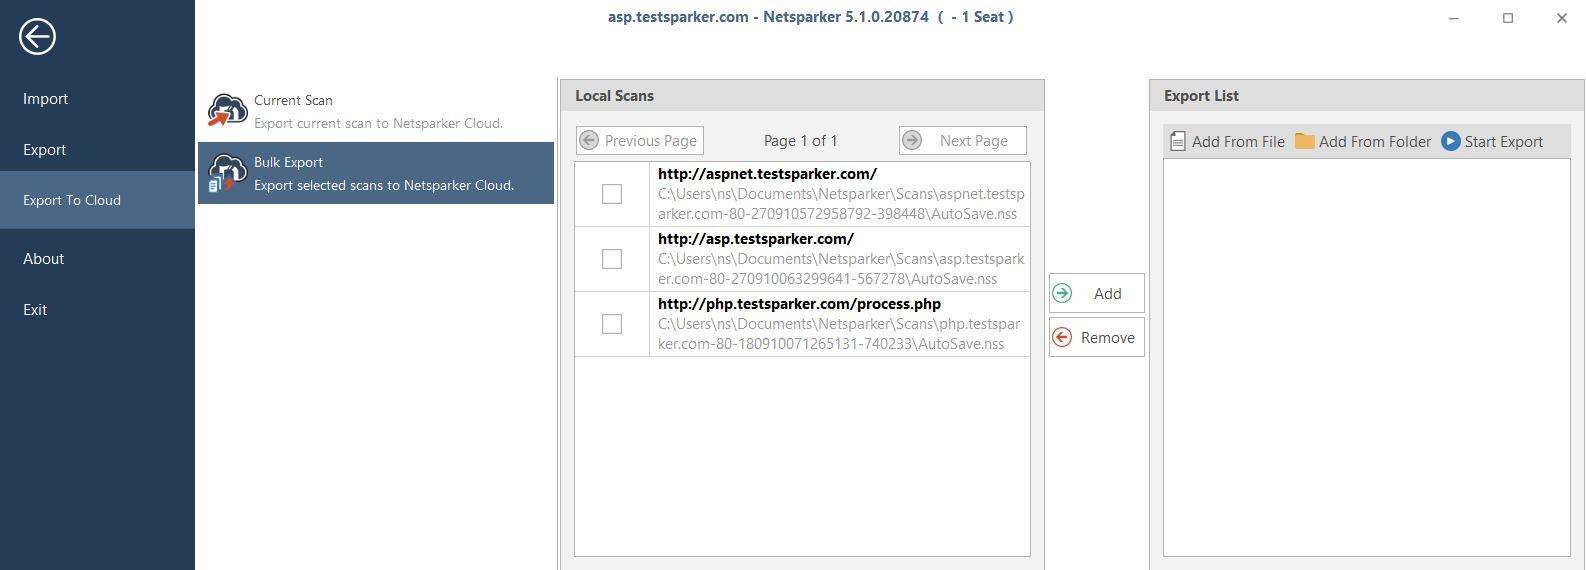 Bulk Export to Cloud Feature